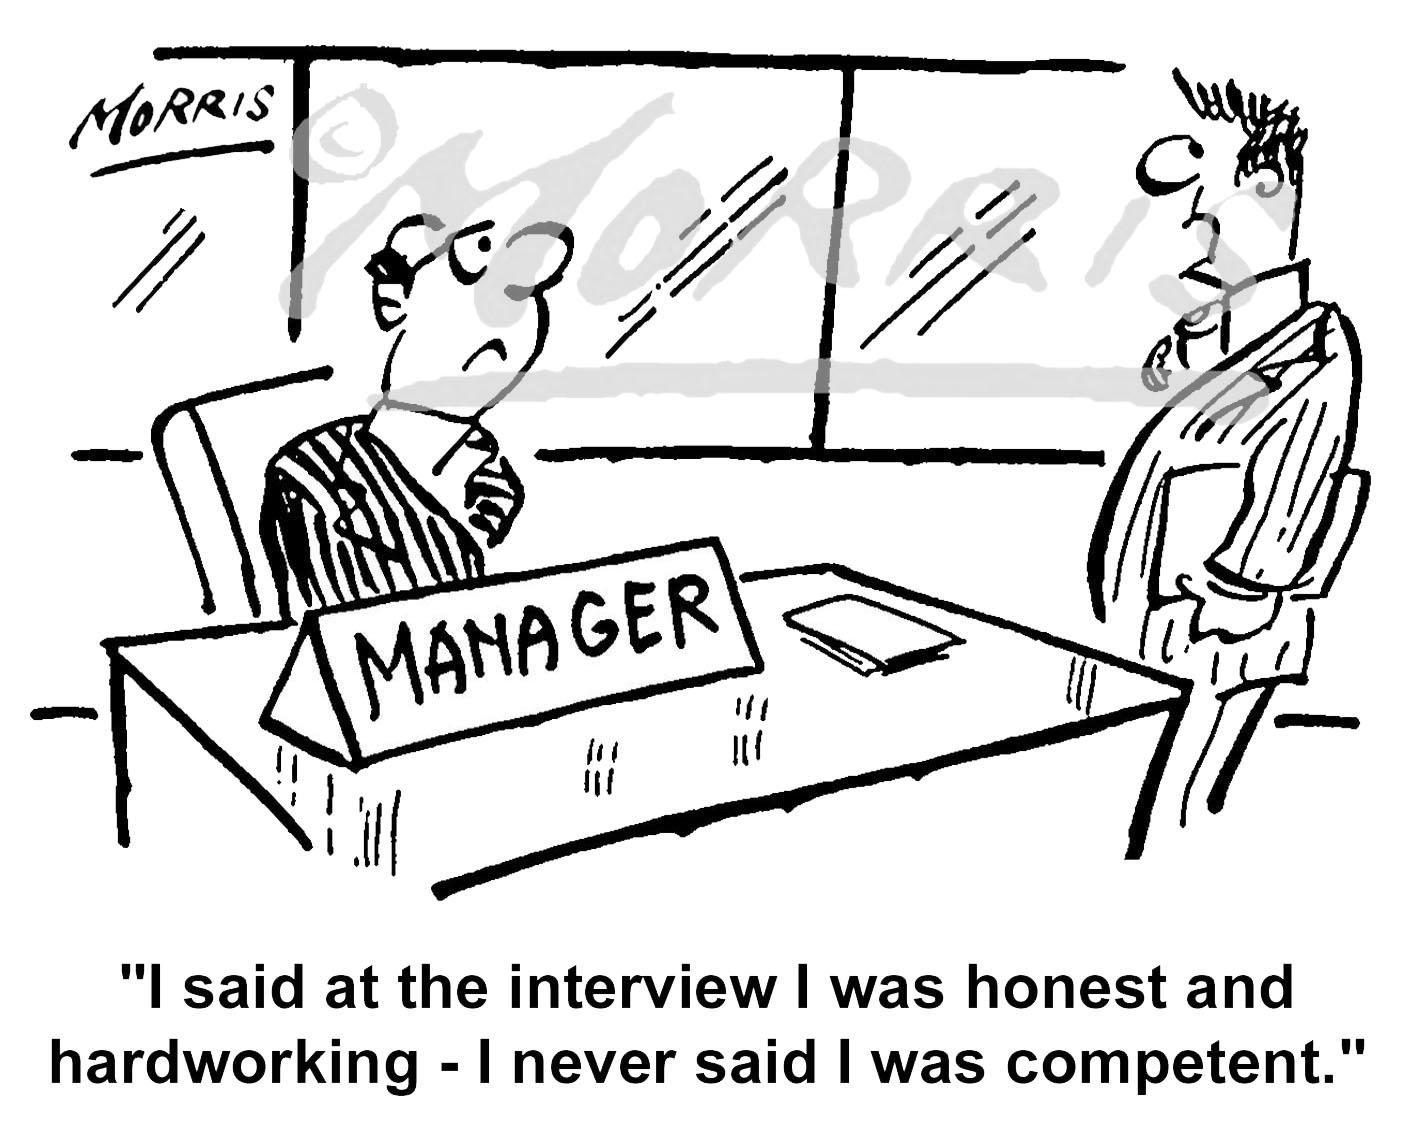 Manager employee interview cartoon Ref: 0676bw